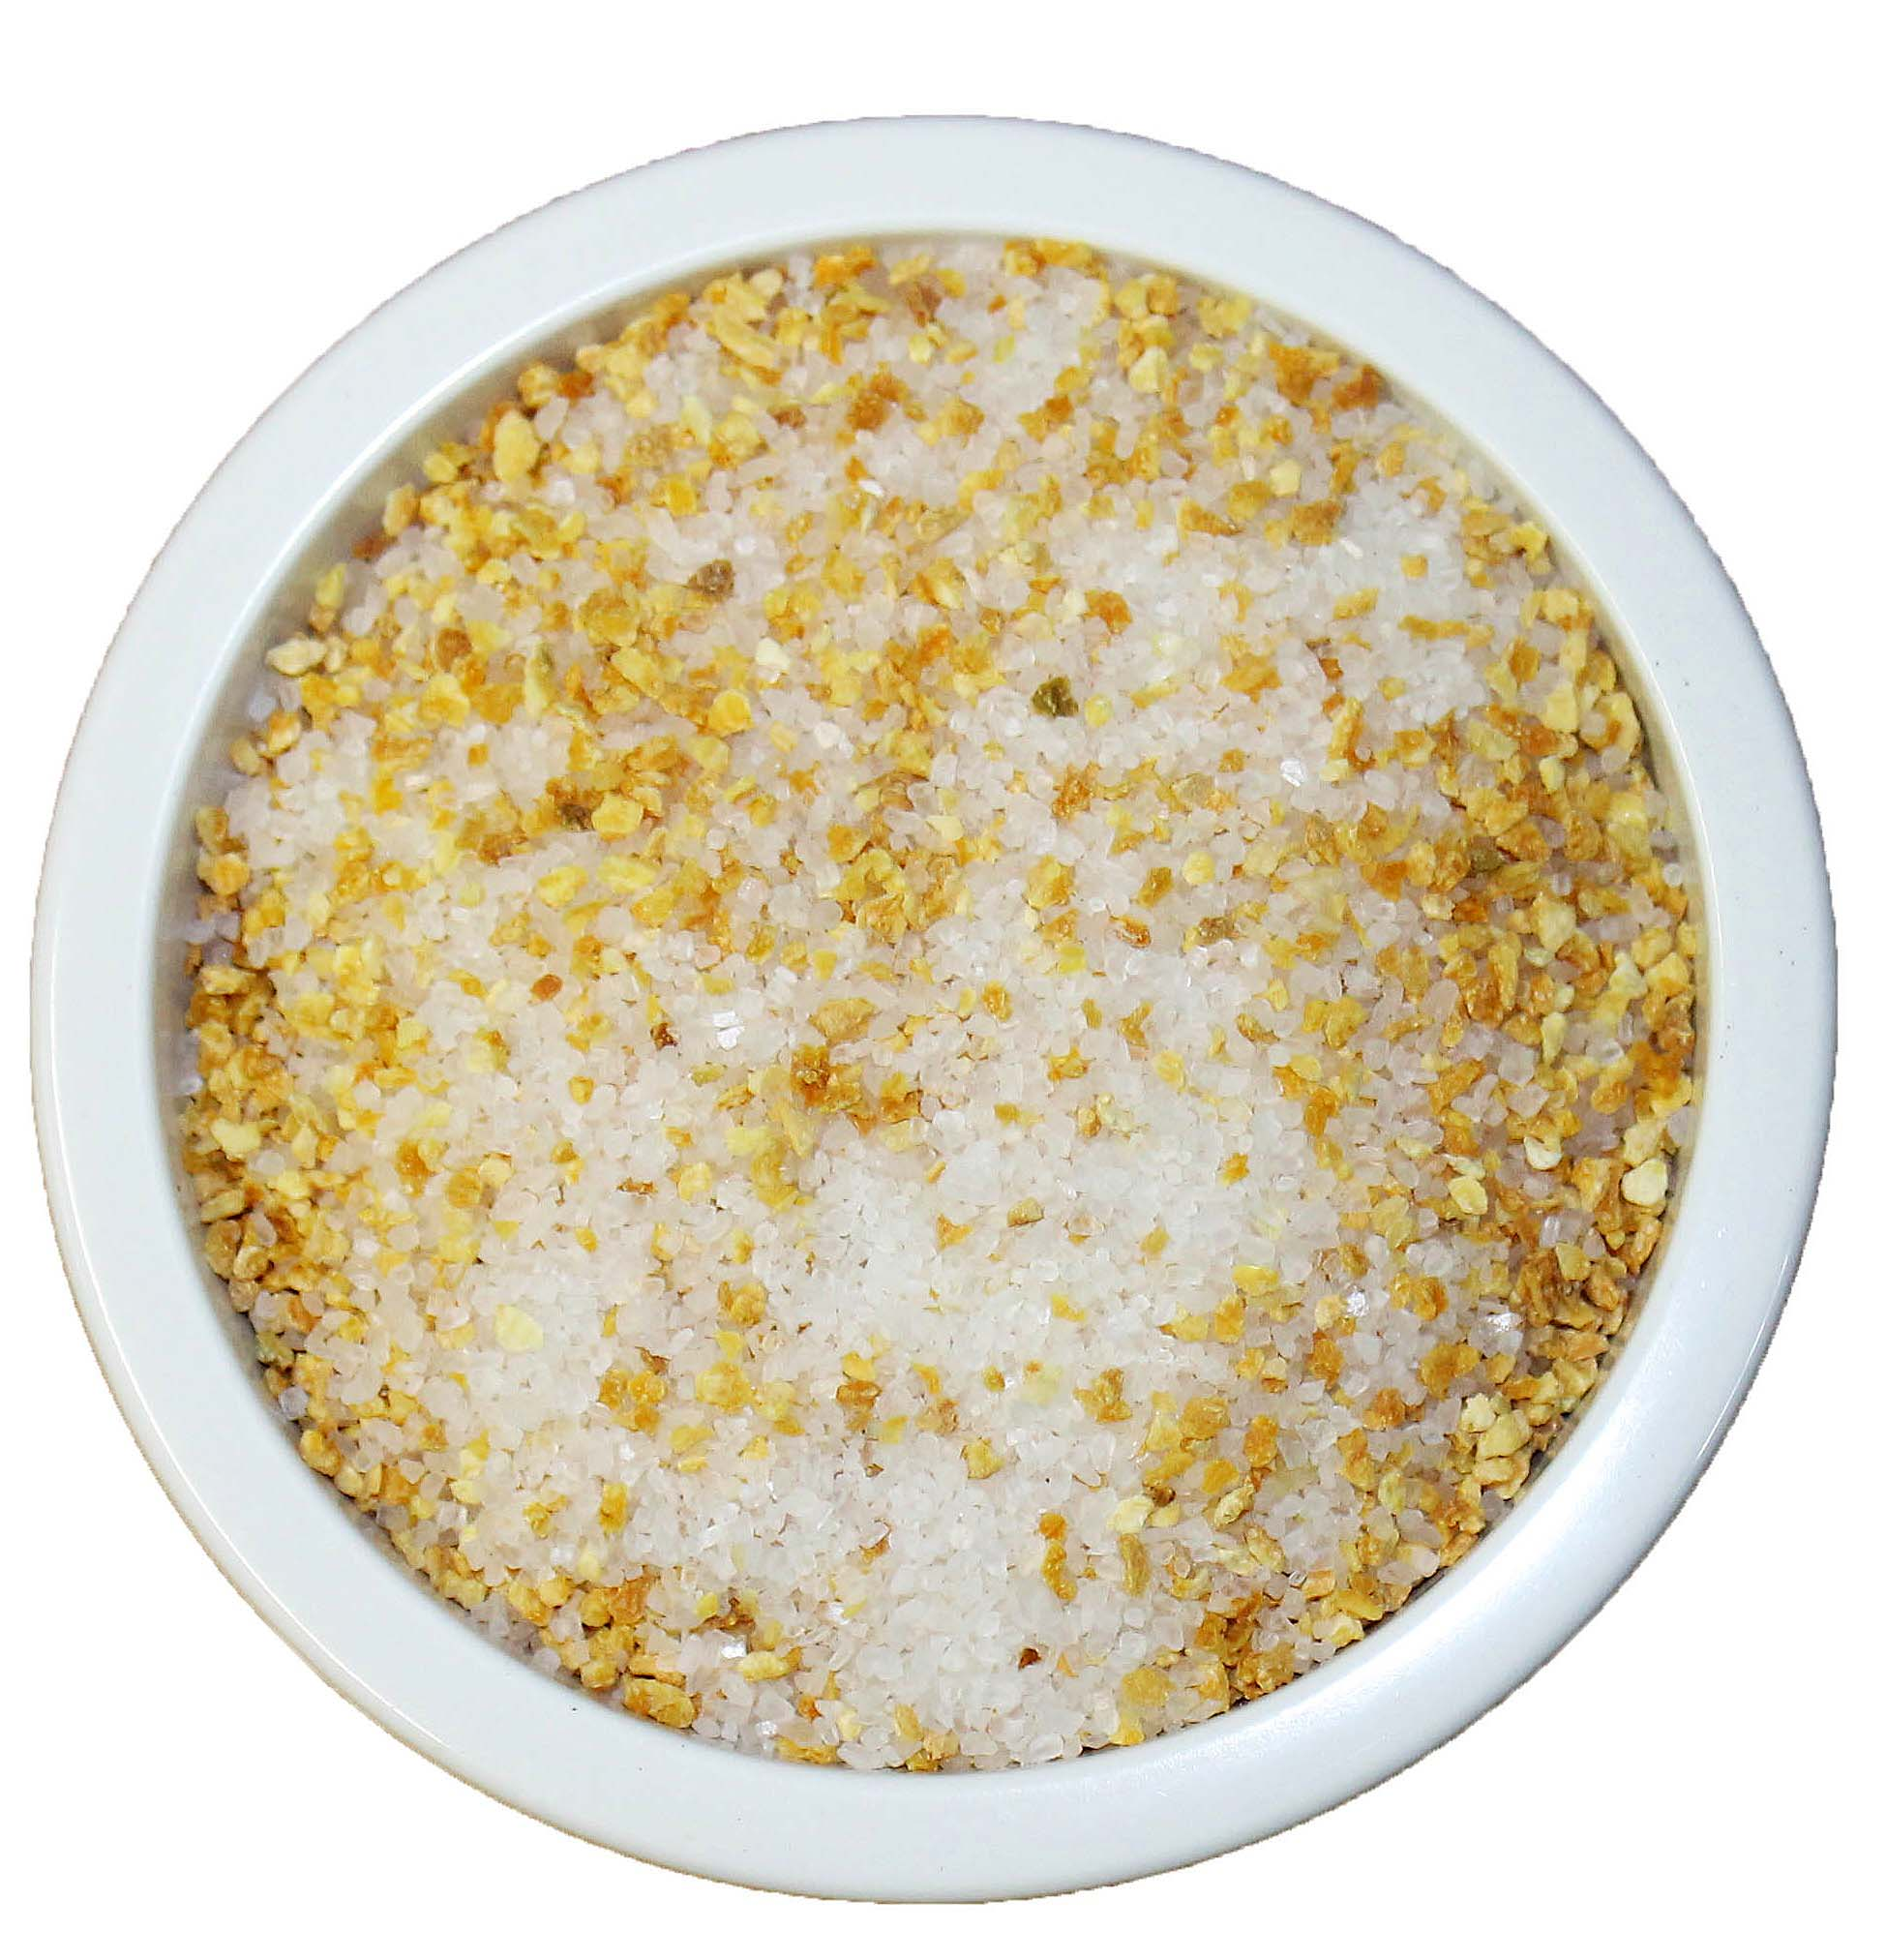 Zitronensalz 100 g Zitronen Salz grob Steinsalz 1A Qualität PEnandiTRA ®